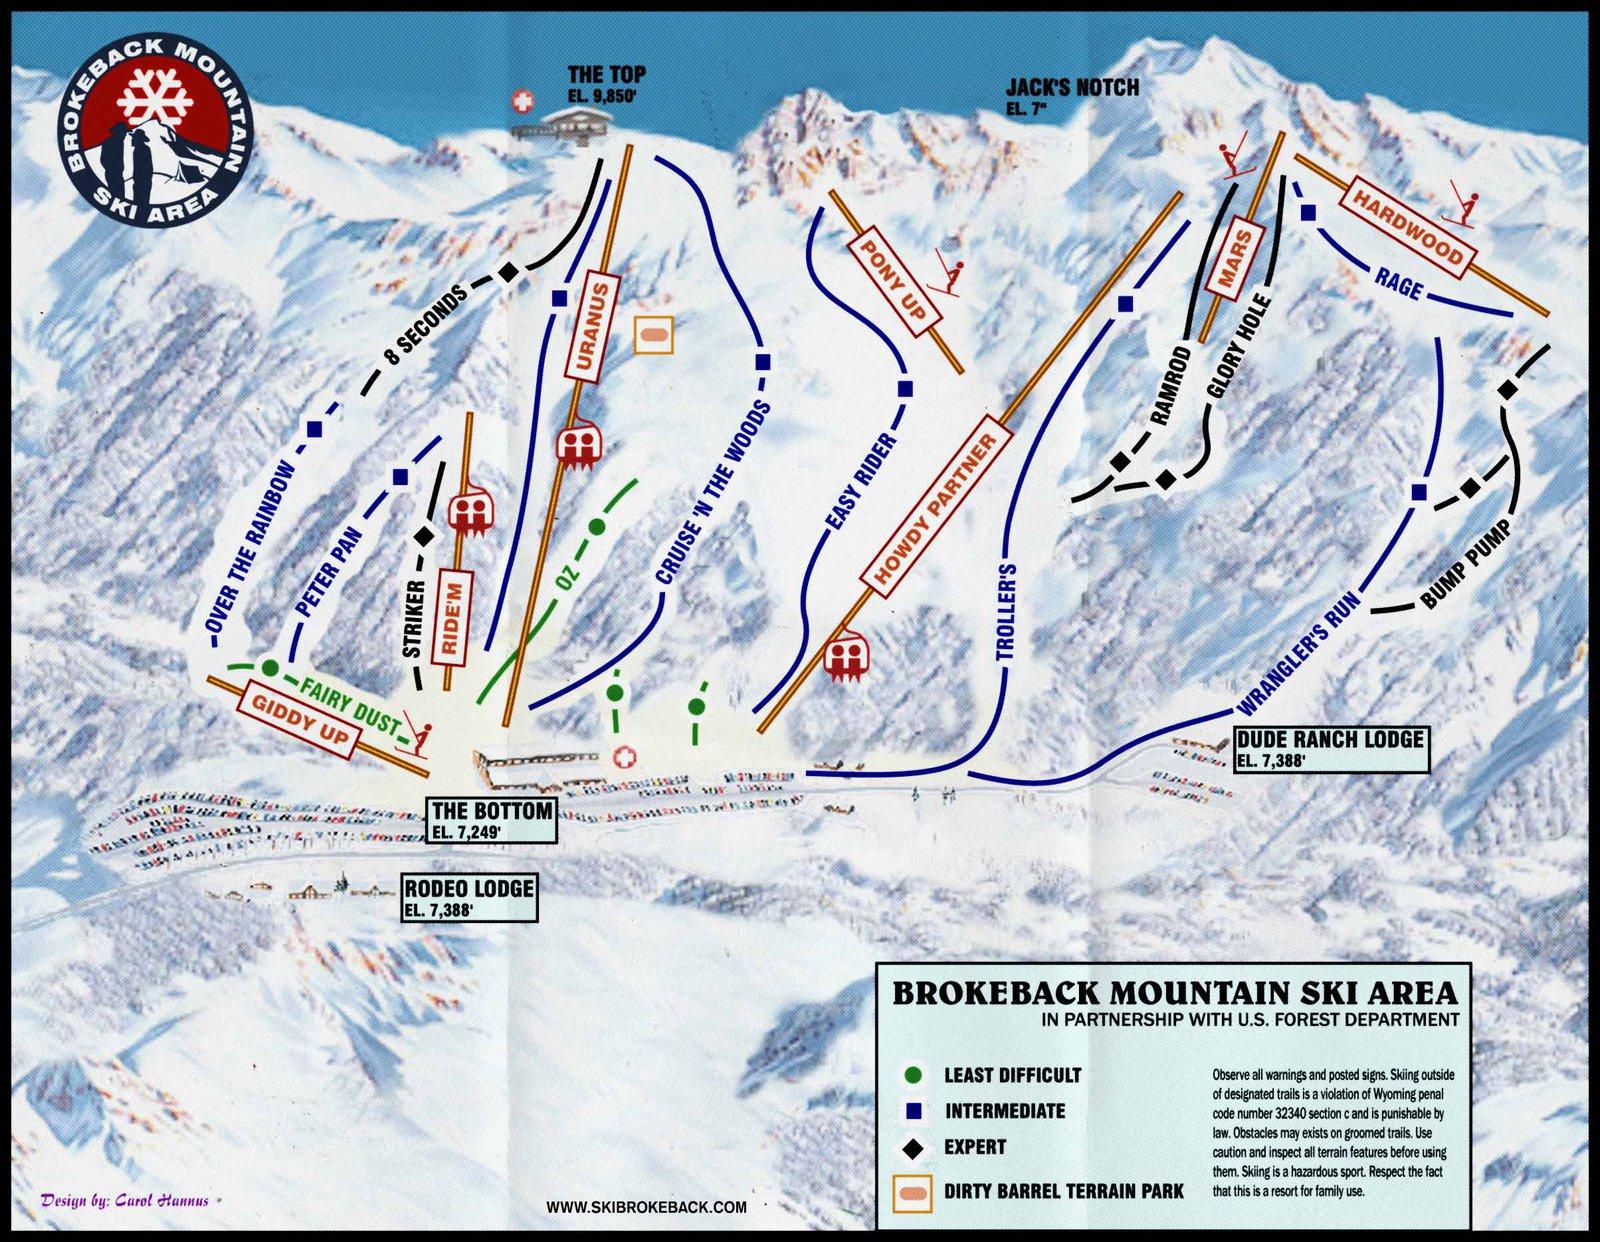 Ski Brokeback